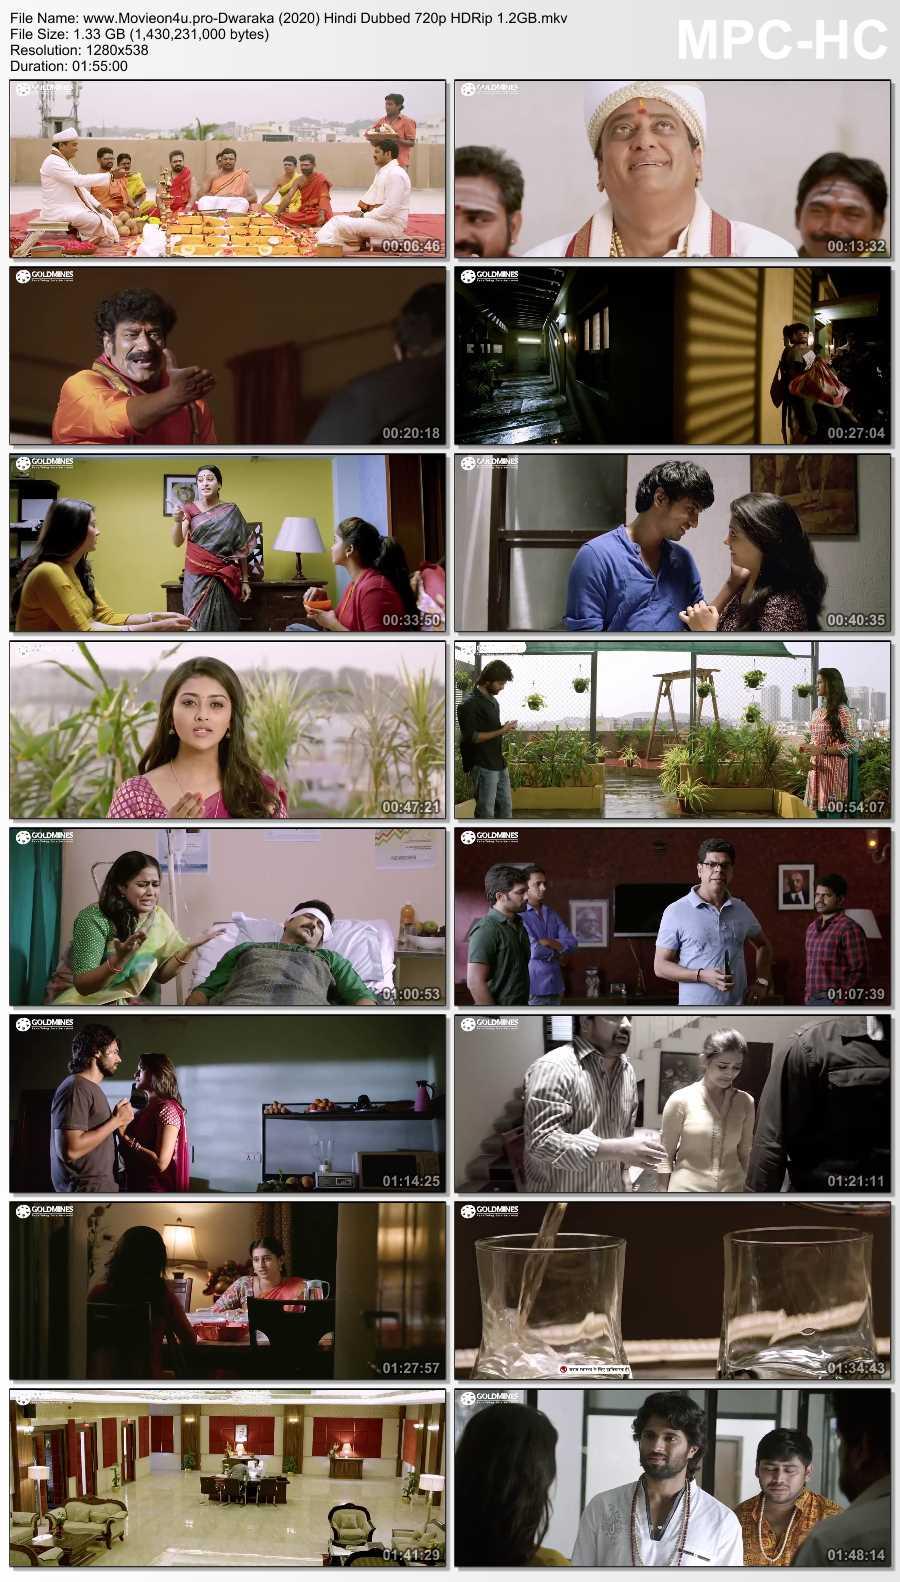 Dwaraka (2020) Hindi Dubbed Full Movie Download